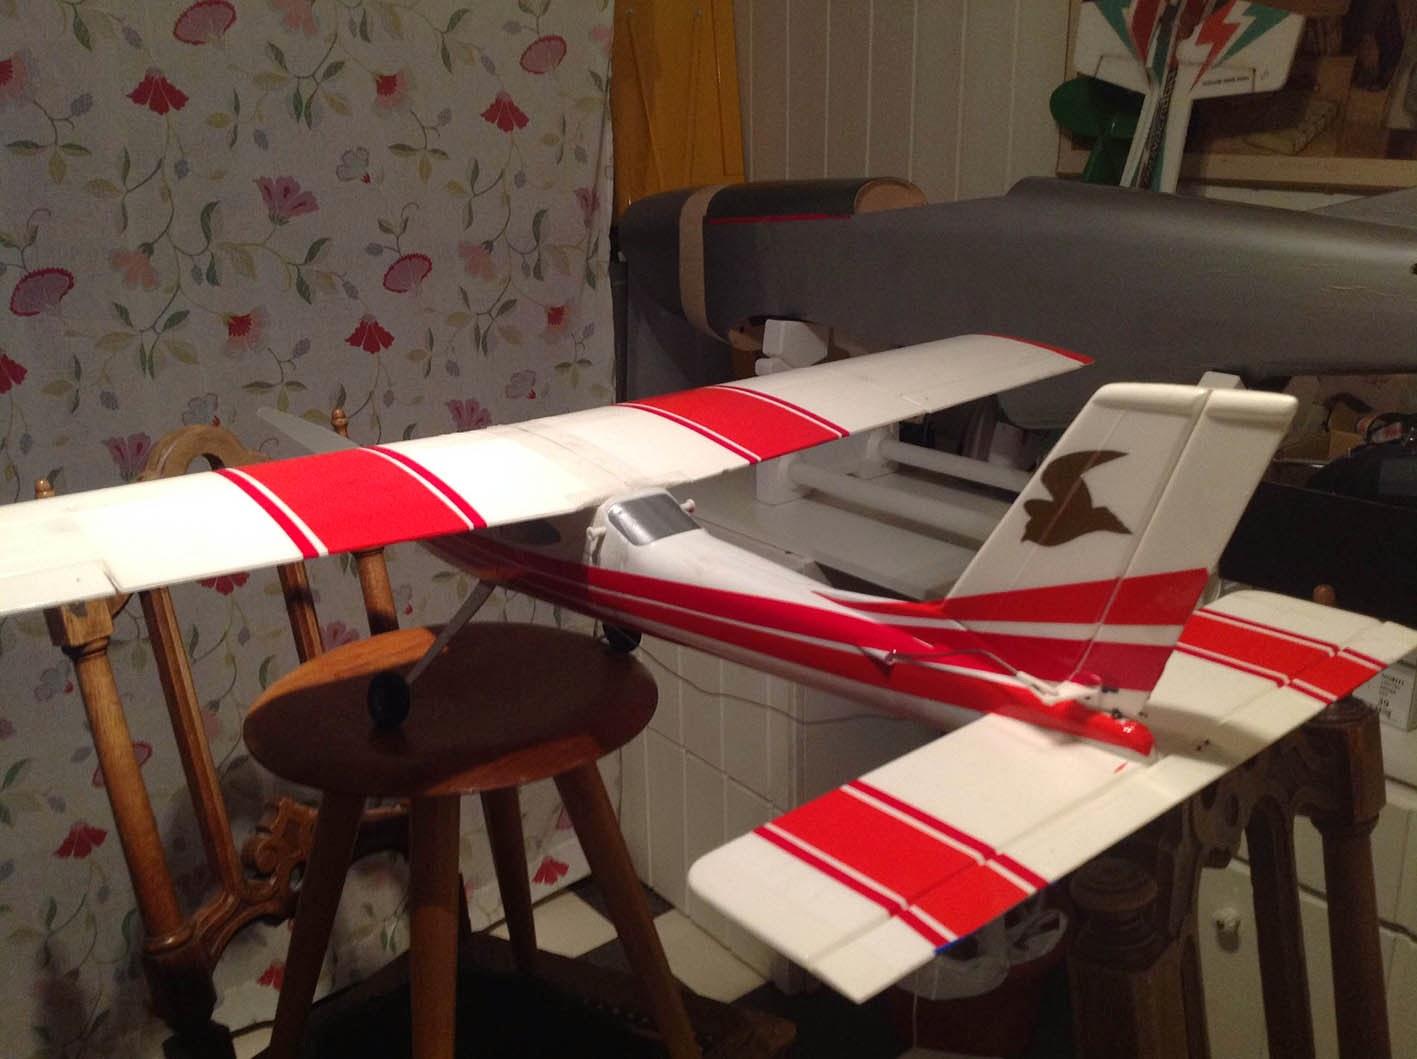 Hangar 883